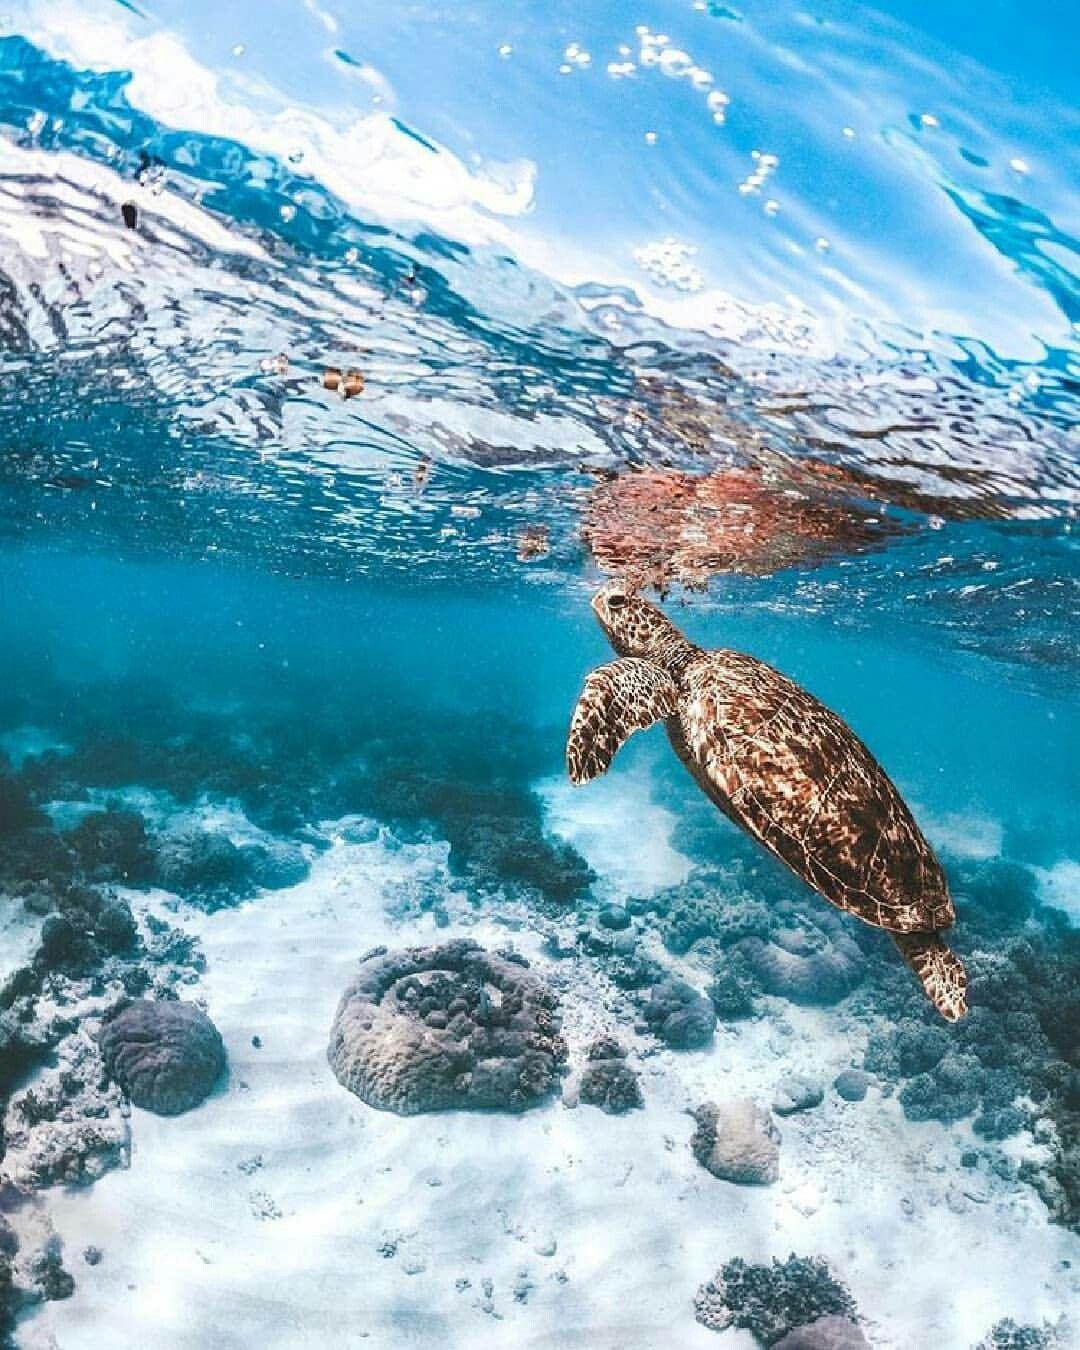 Sea Turtle Great digital background idea Save the sea